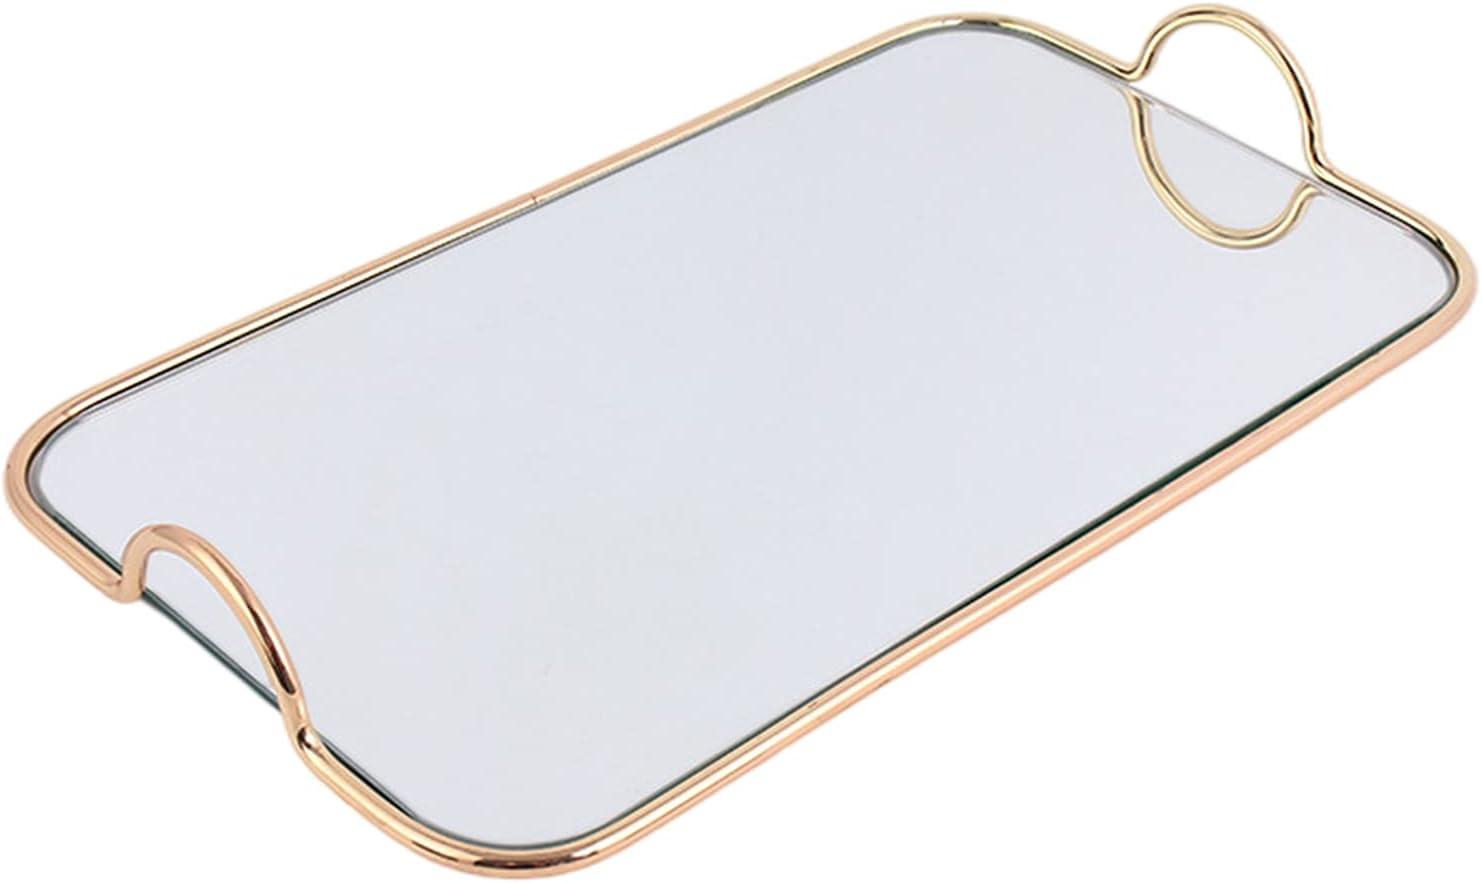 Newmind Rectangular Mirrored Tray w service Handles Makeup Max 47% OFF Jewelry Perfu